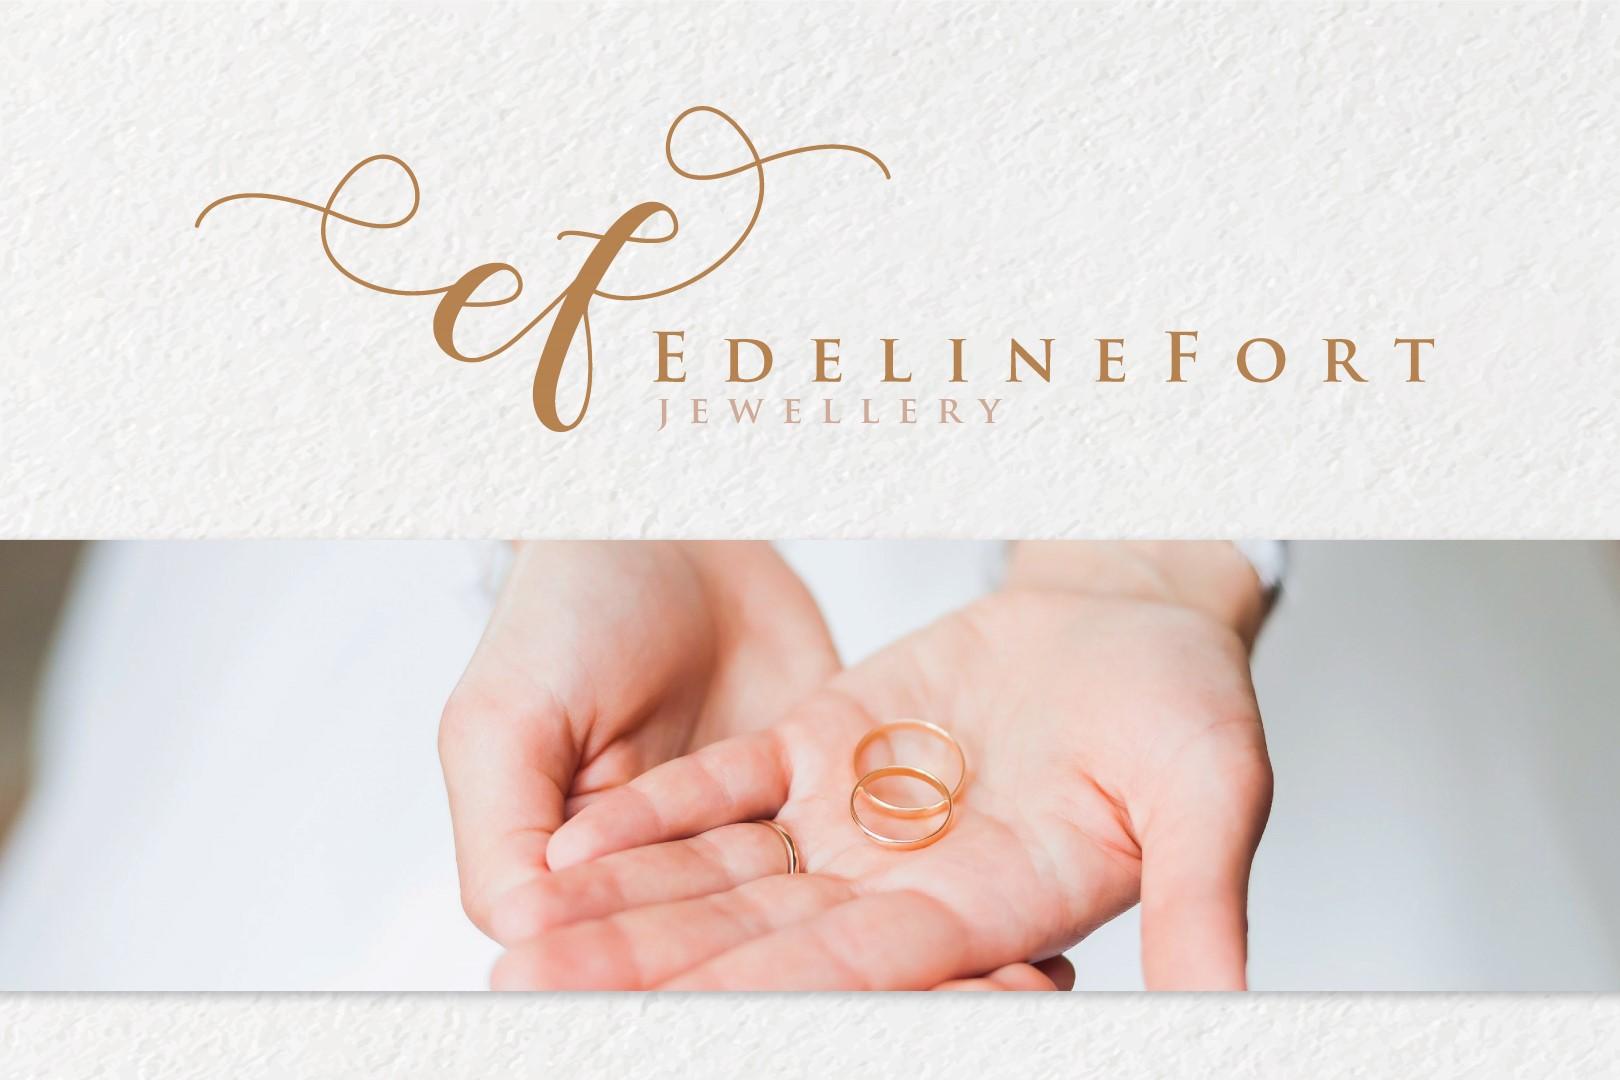 Zelifa - Lovely Font example image 4